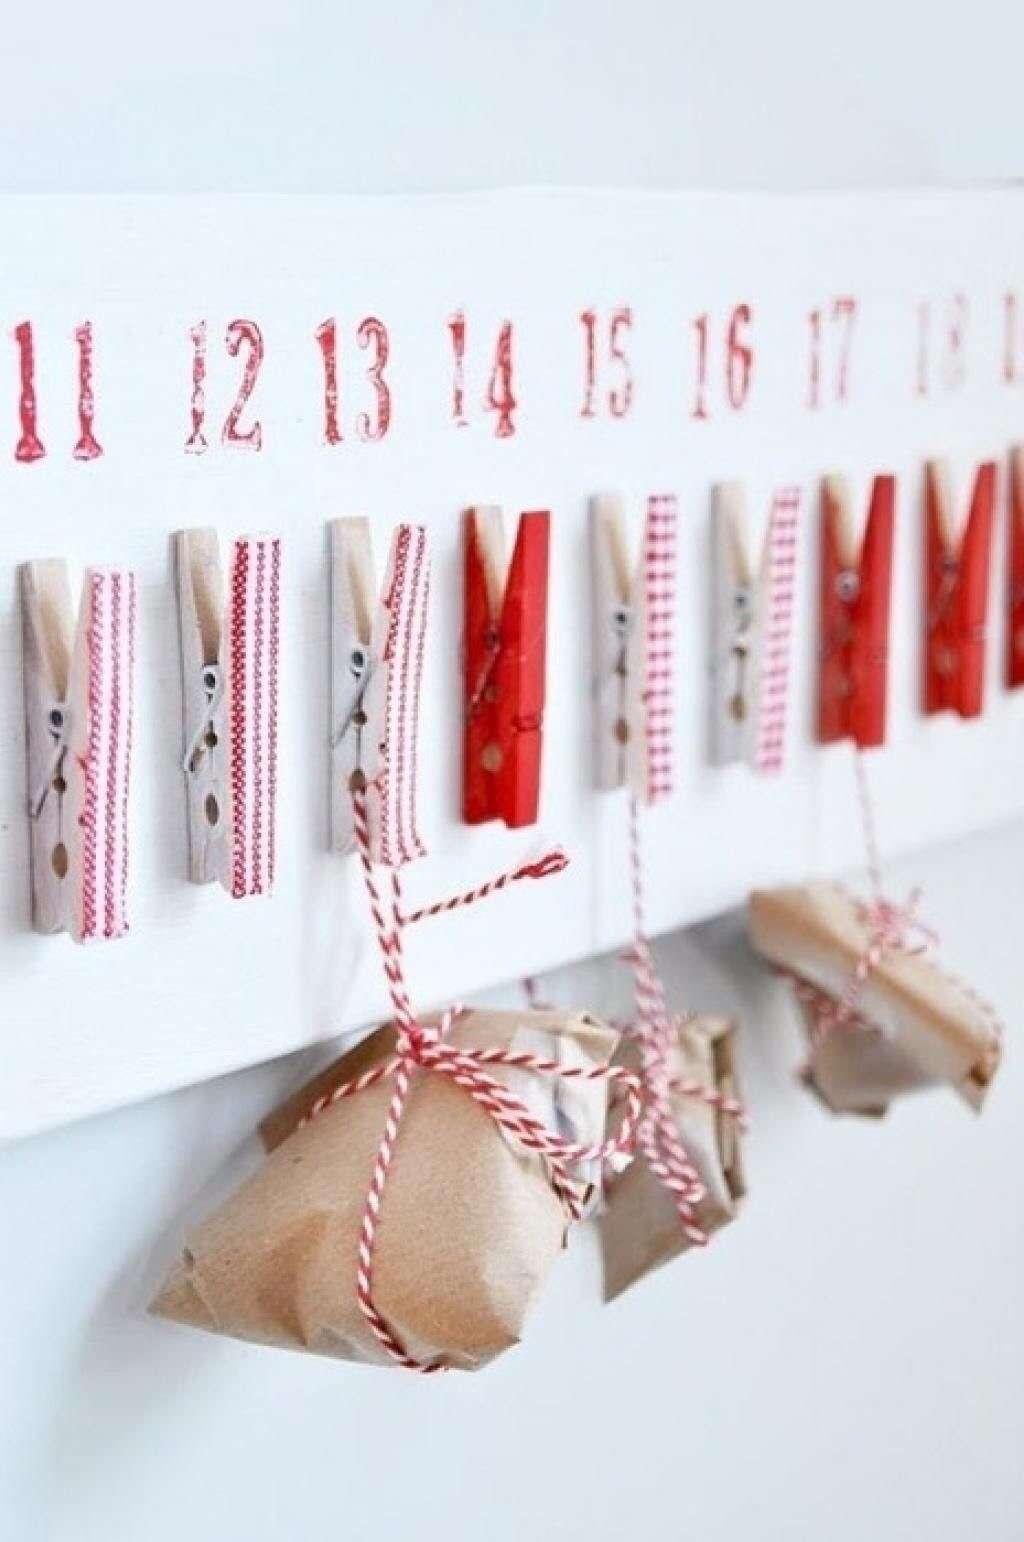 Calendario de Adviento con pinzas